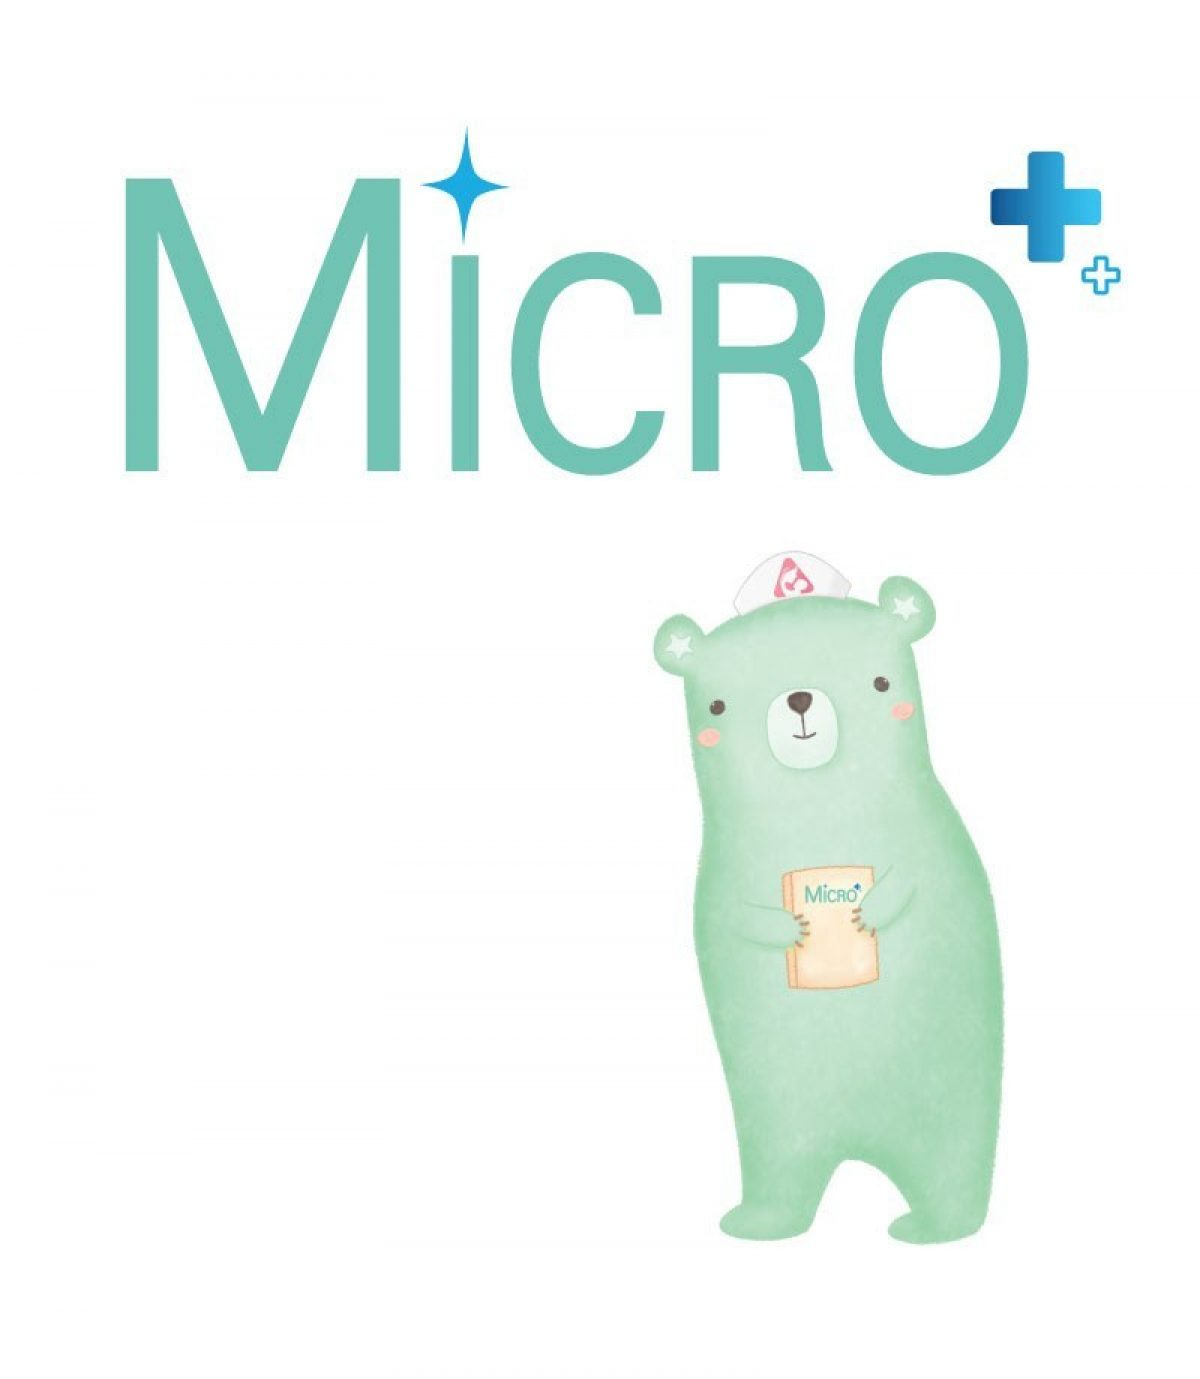 Micro Logo mtime20191211094344